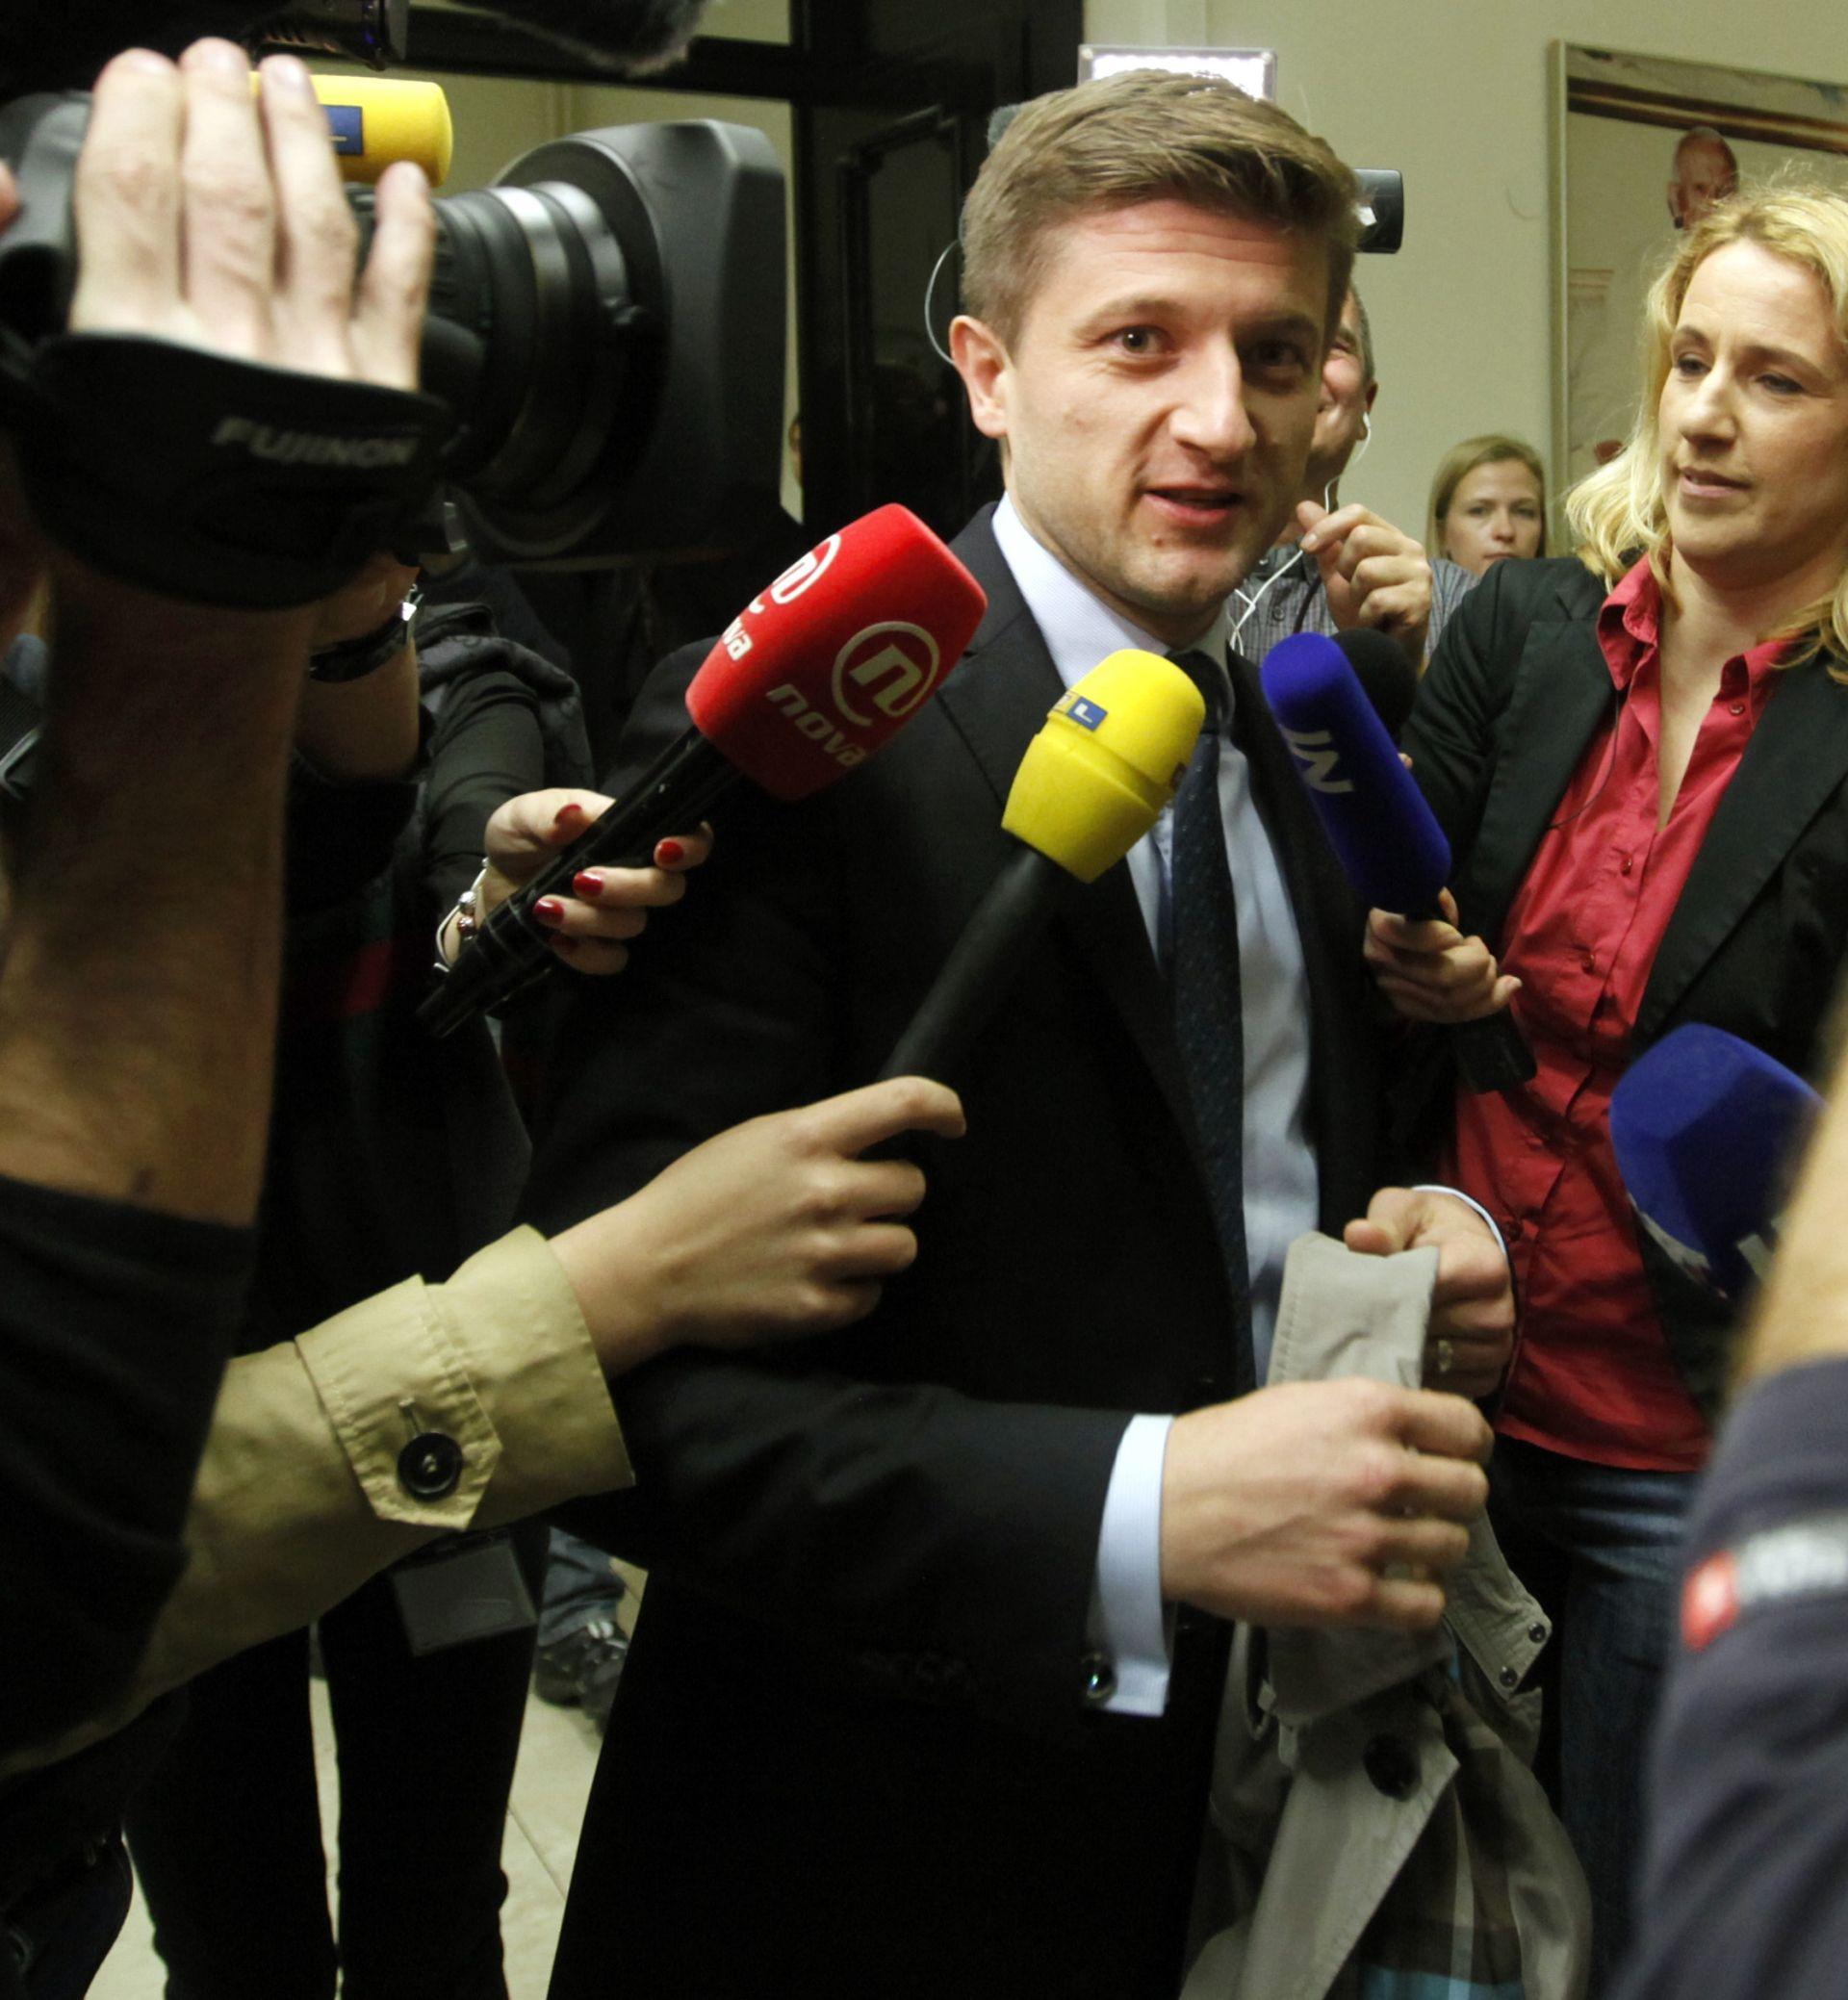 MINISTAR MARIĆ: Pripreme porezne reforme paralelno s proračunom